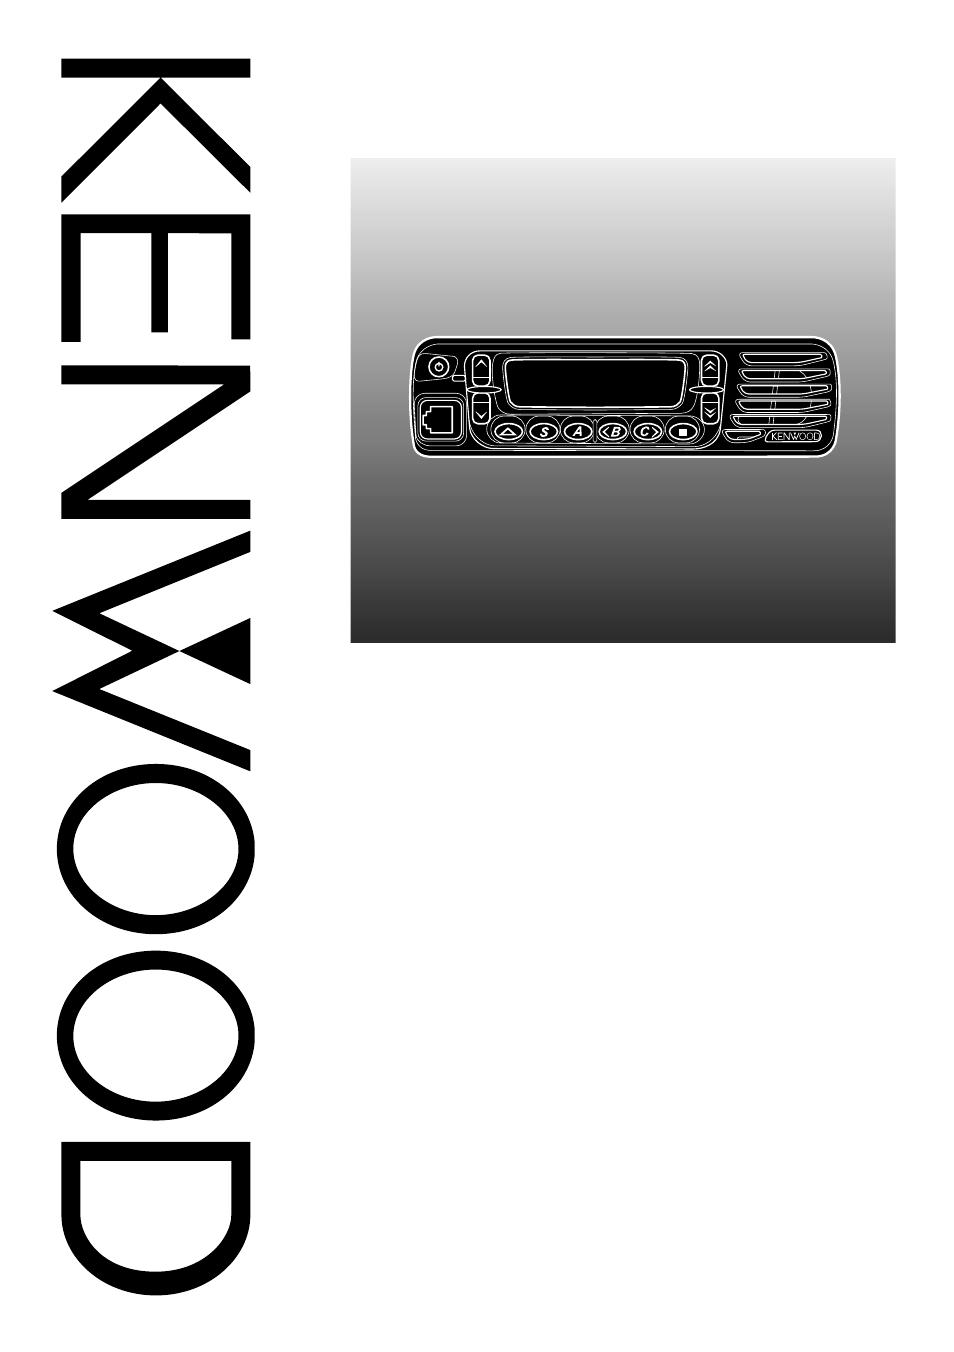 kenwood tk 7180 user manual 33 pages also for tk 8180 tk 7180h rh manualsdir com Kenwood Tk 7180 tk-7180h service manual